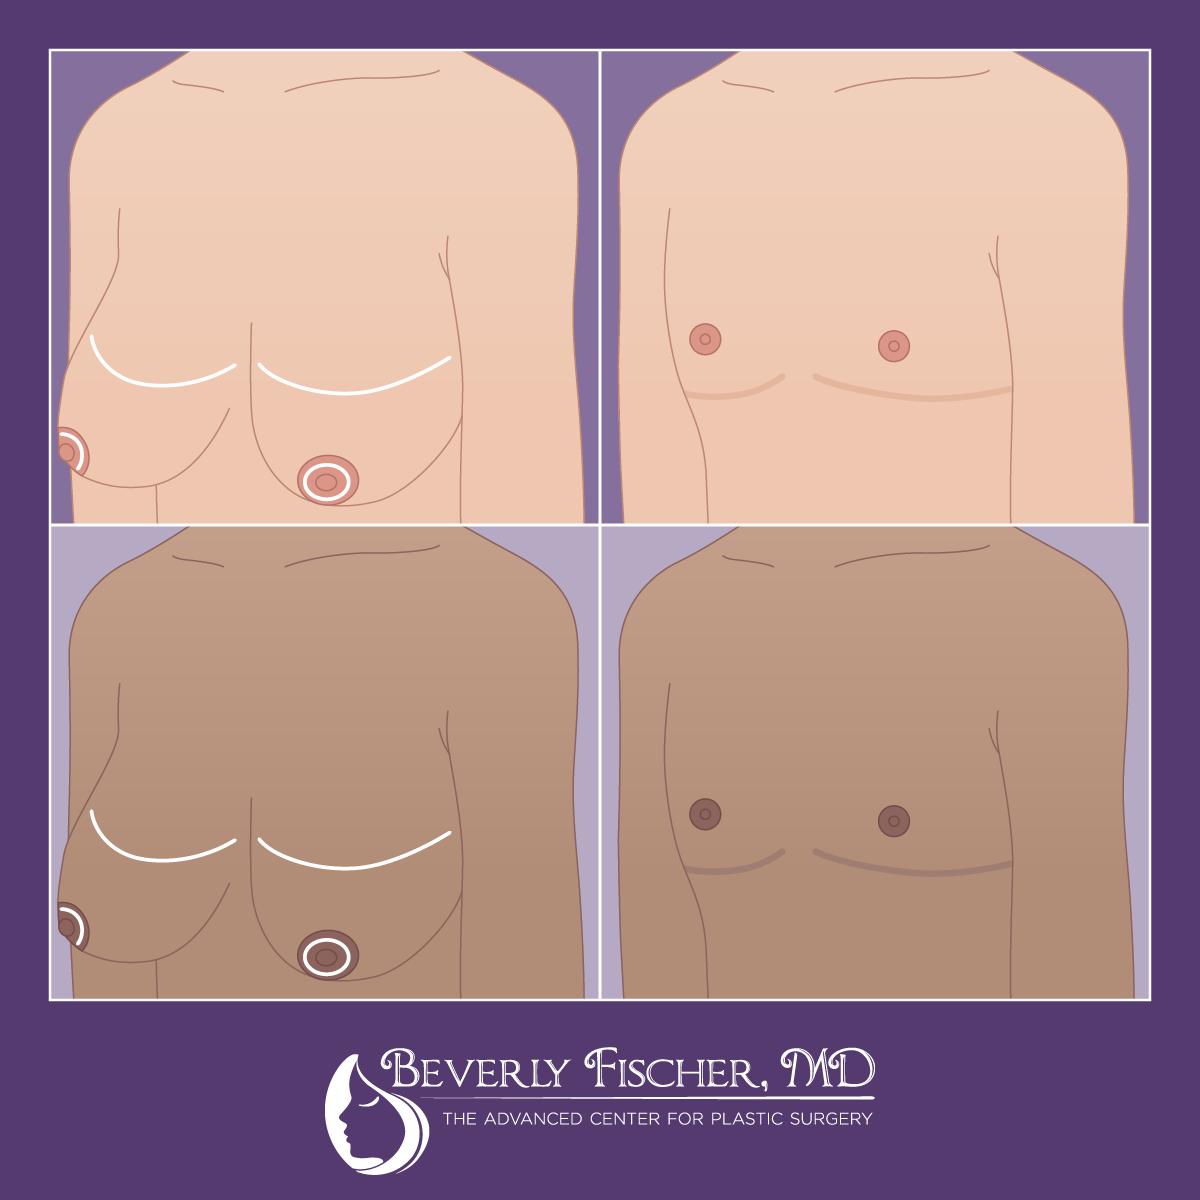 BF_FTM Surgery Graphics_2_1200px